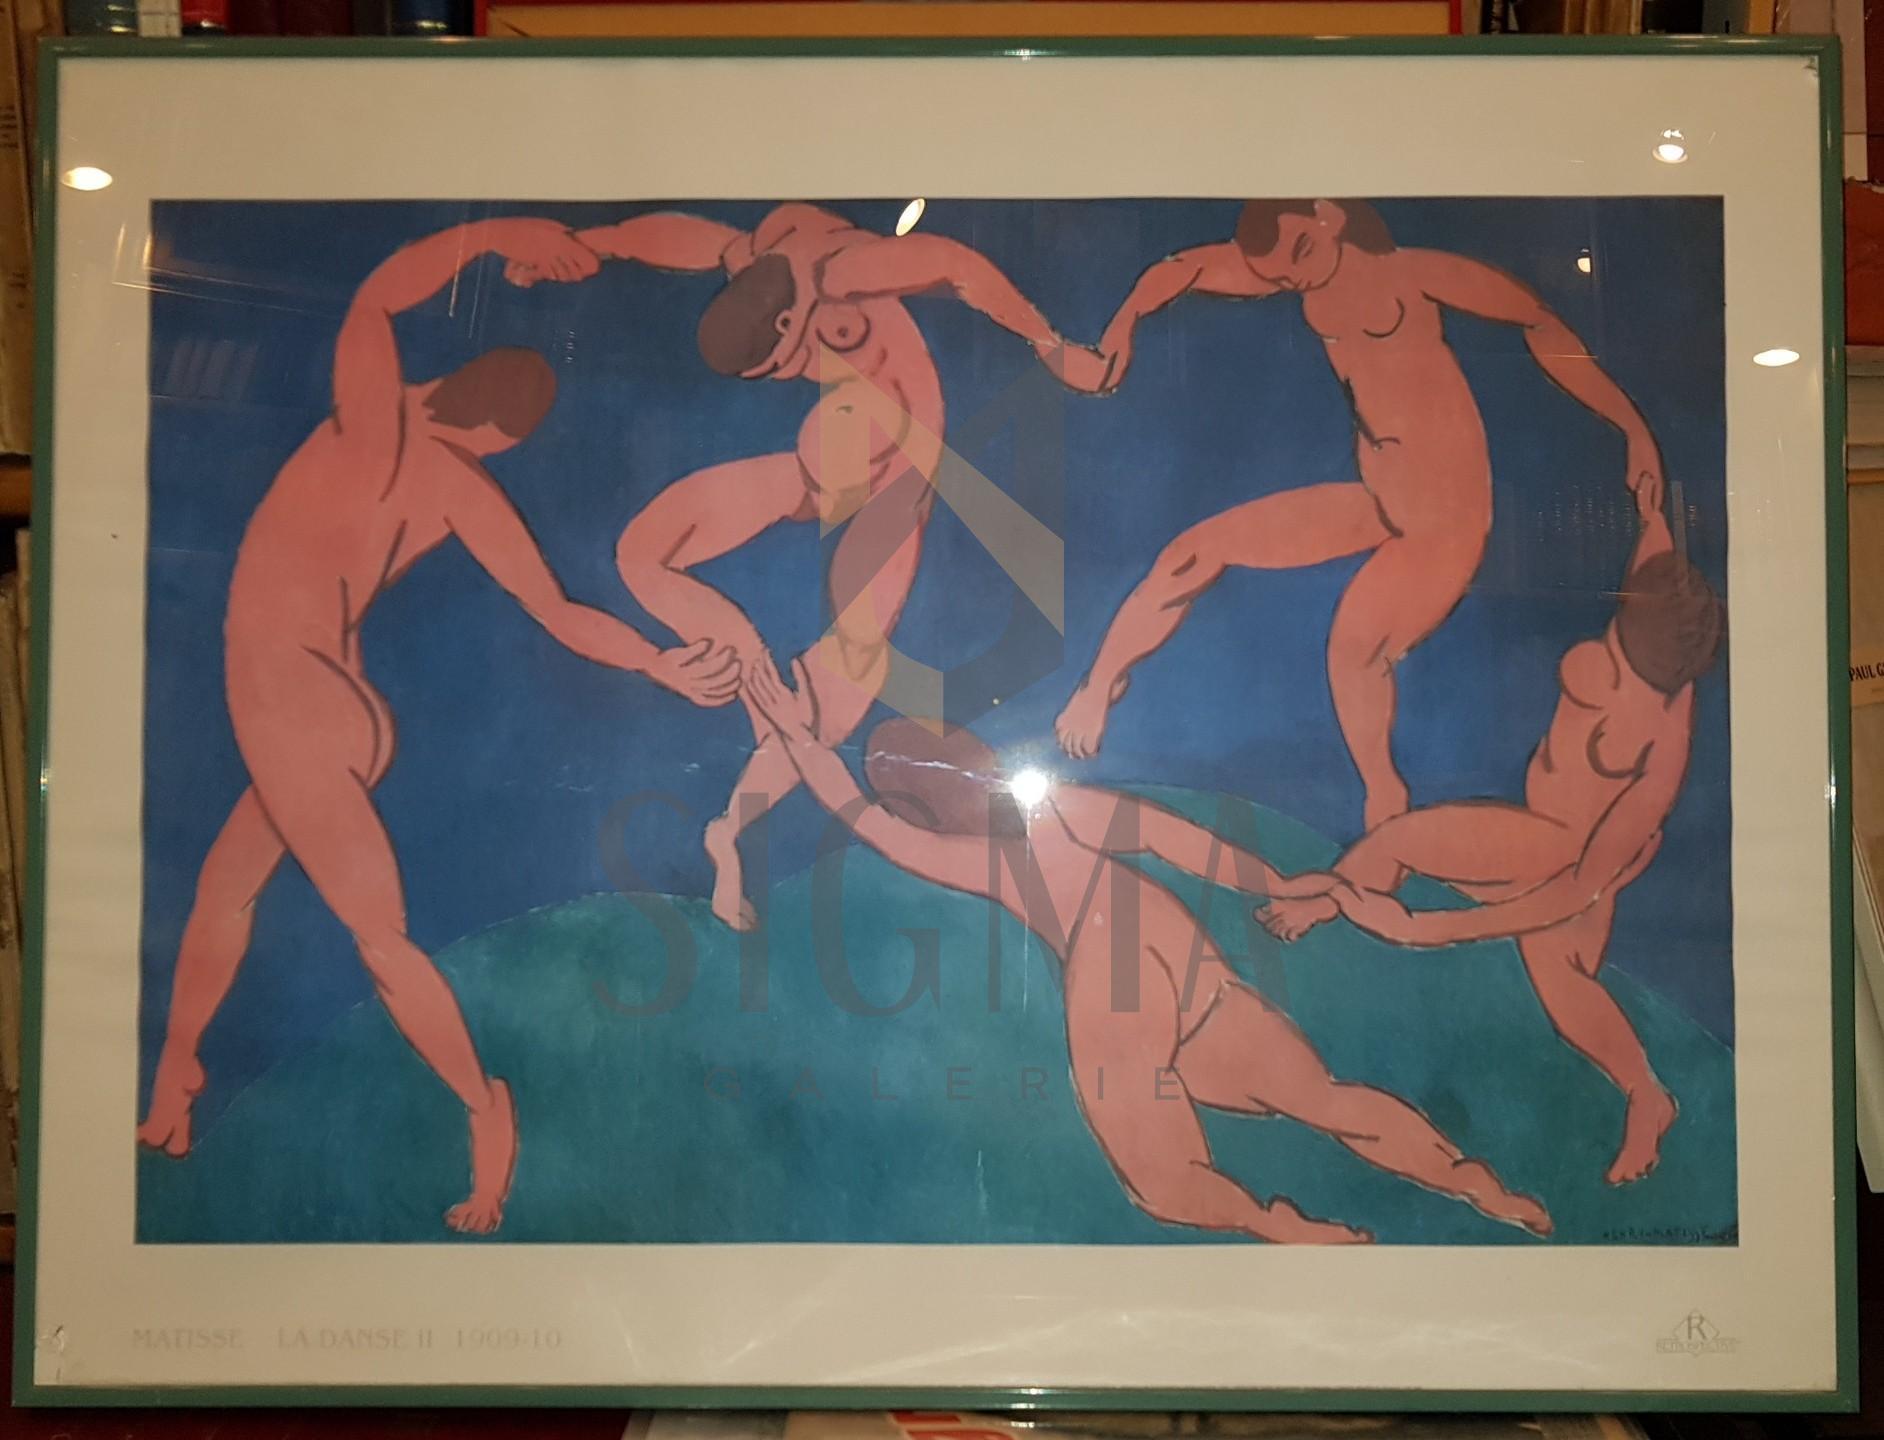 "AFIS, HENRI MATISSE "" LE DANCE II"", 61cm. X 81cm."